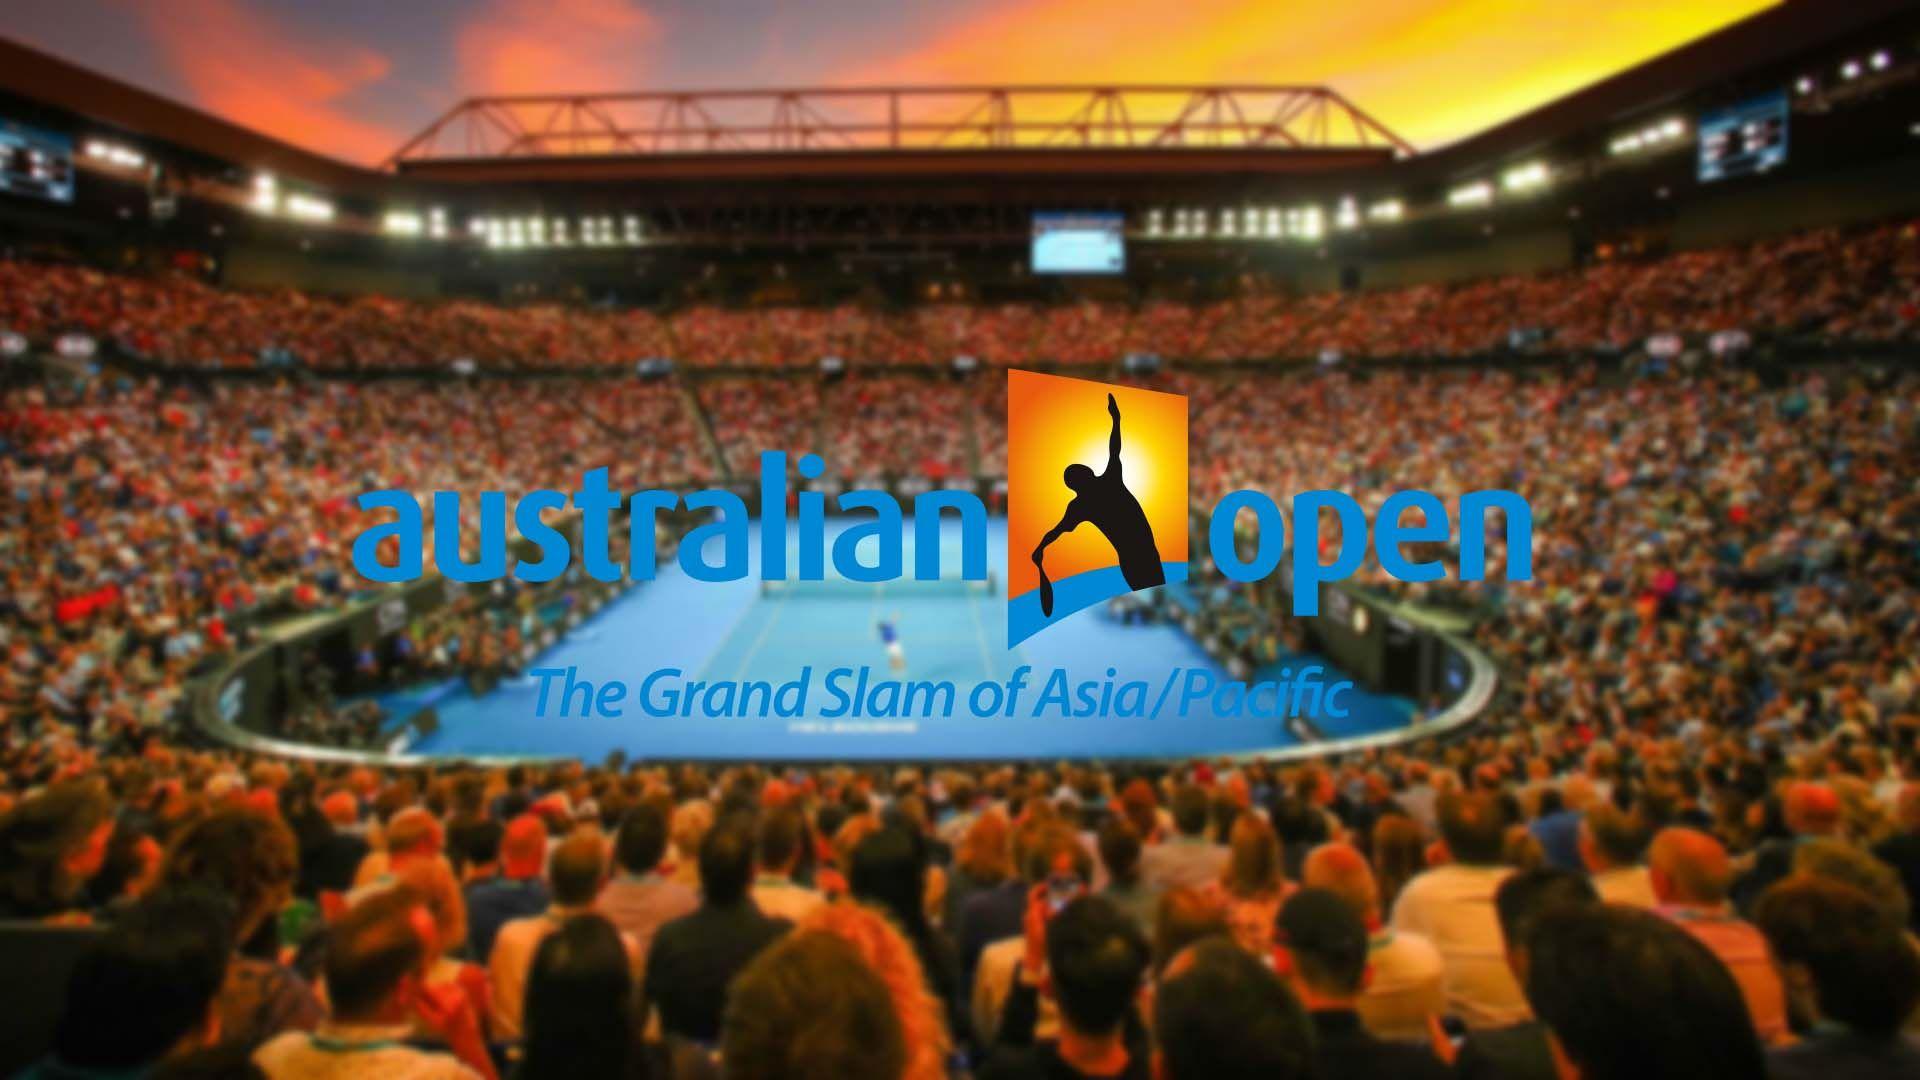 Australian Open Tennis 2020 Live Stream TV Coverage in